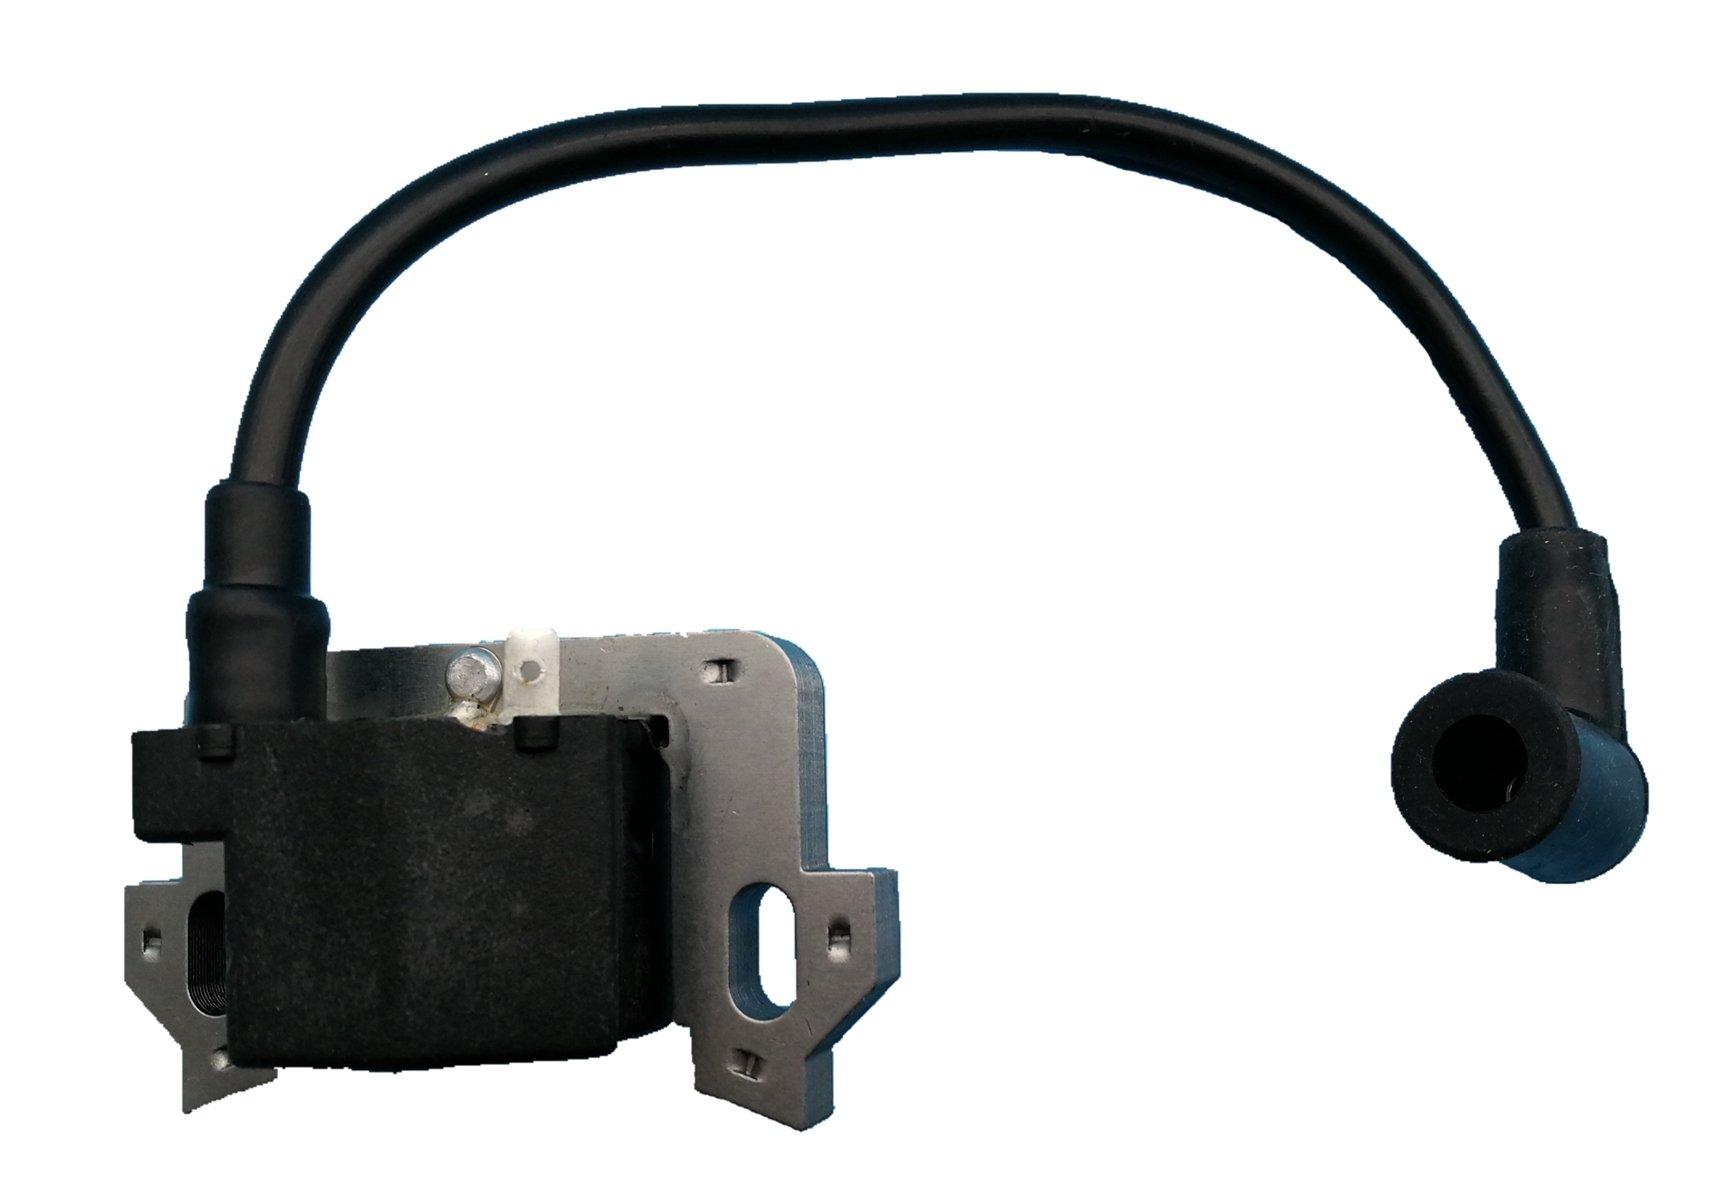 Generic Ignition Coil for Honda GC135 GC160 GC190 GCV135 GCV160 GCV190 GS160 GS190 GSV160 GSV190 Replace 30500-ZL8-004 30500-ZL8-014 30500-Z0J-003 30500-Z0J-004 New Z22